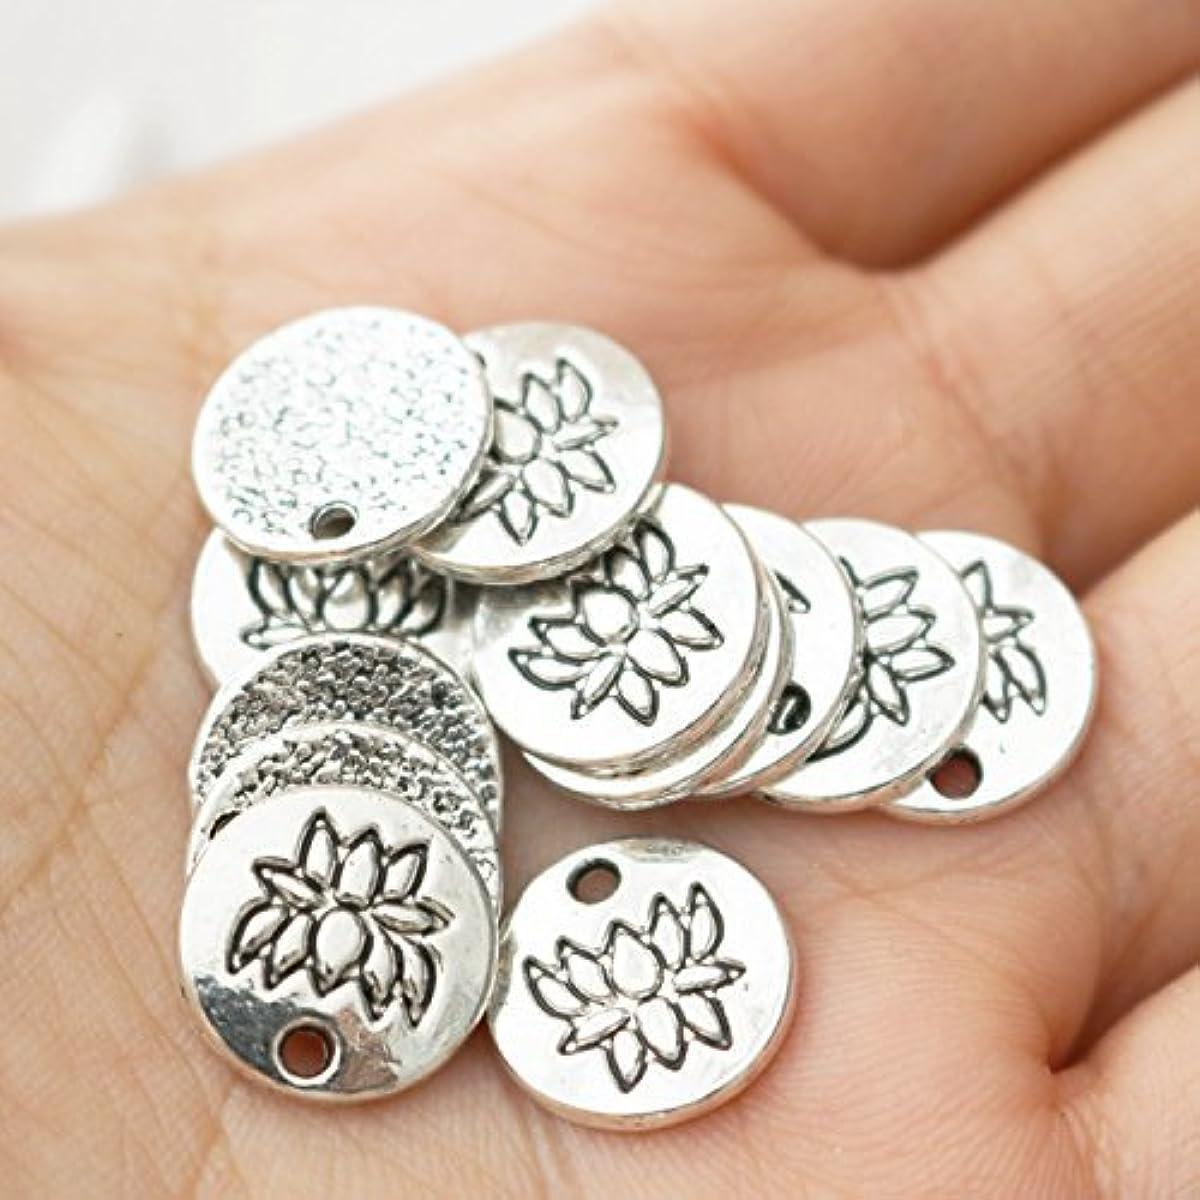 30 PCs Tiny Lotus Pendants Lotus Charm Antique Silver Charm Zen Buddhist Yoga Charms Pendant for Mindfulness Meditation Jewelry (NS617)